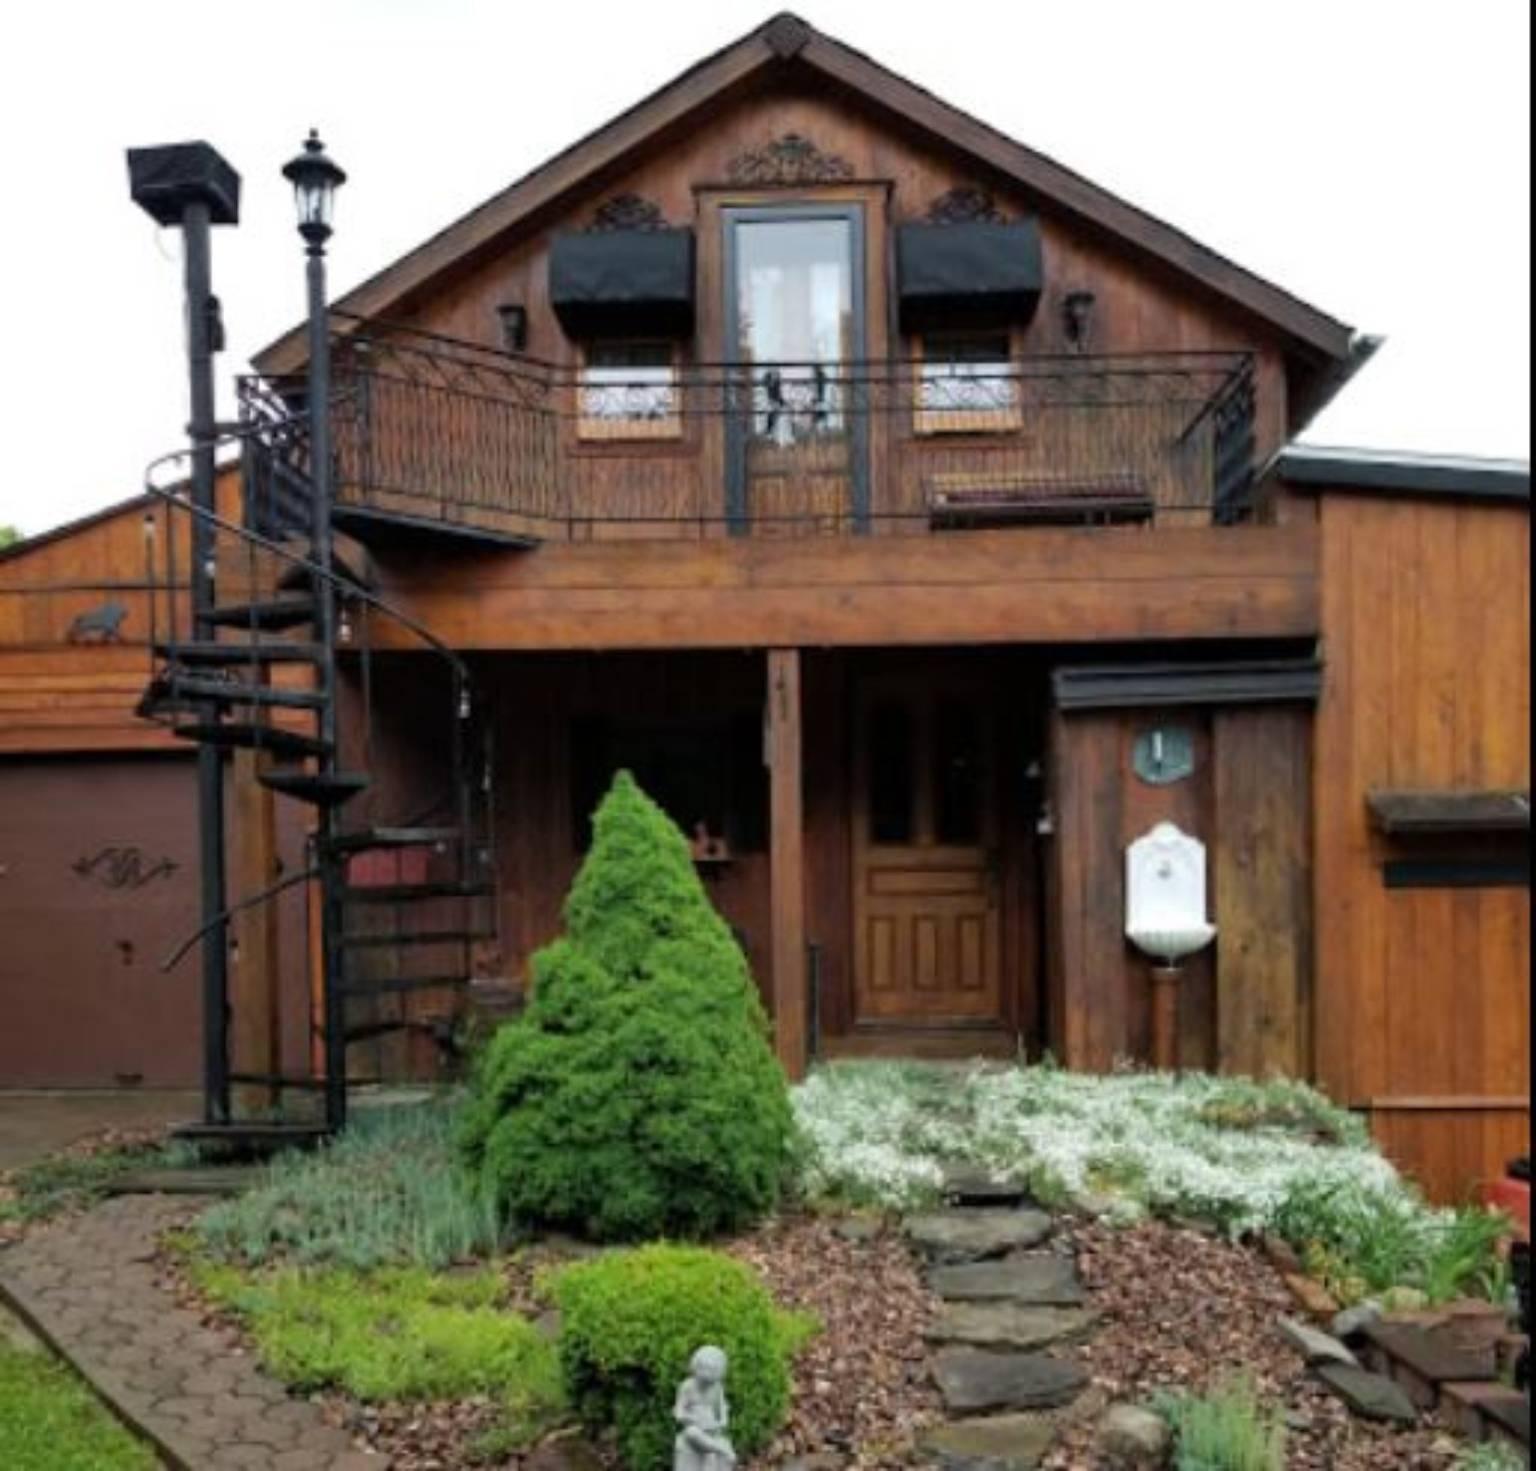 A wooden house at Ethels Garden Bed & Breakfast.